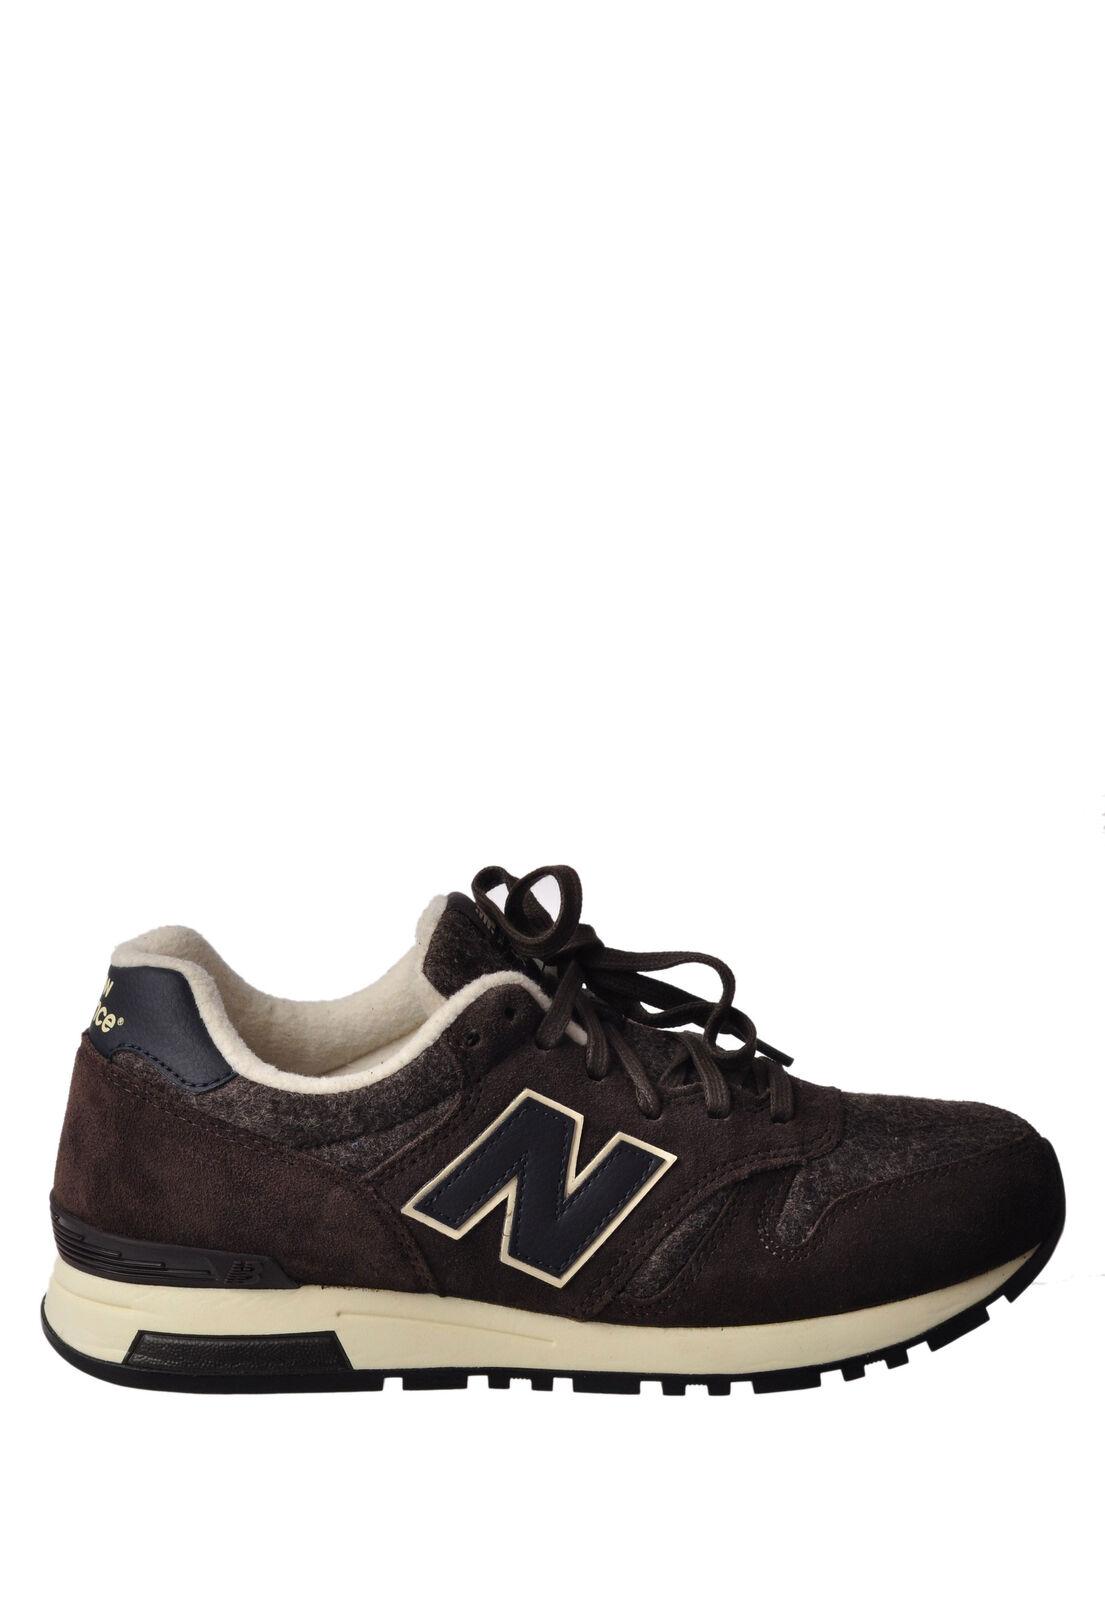 Scarpe casual da uomo  New Balance - Shoes-Sneakers low - Man - Brown - 889408G180716